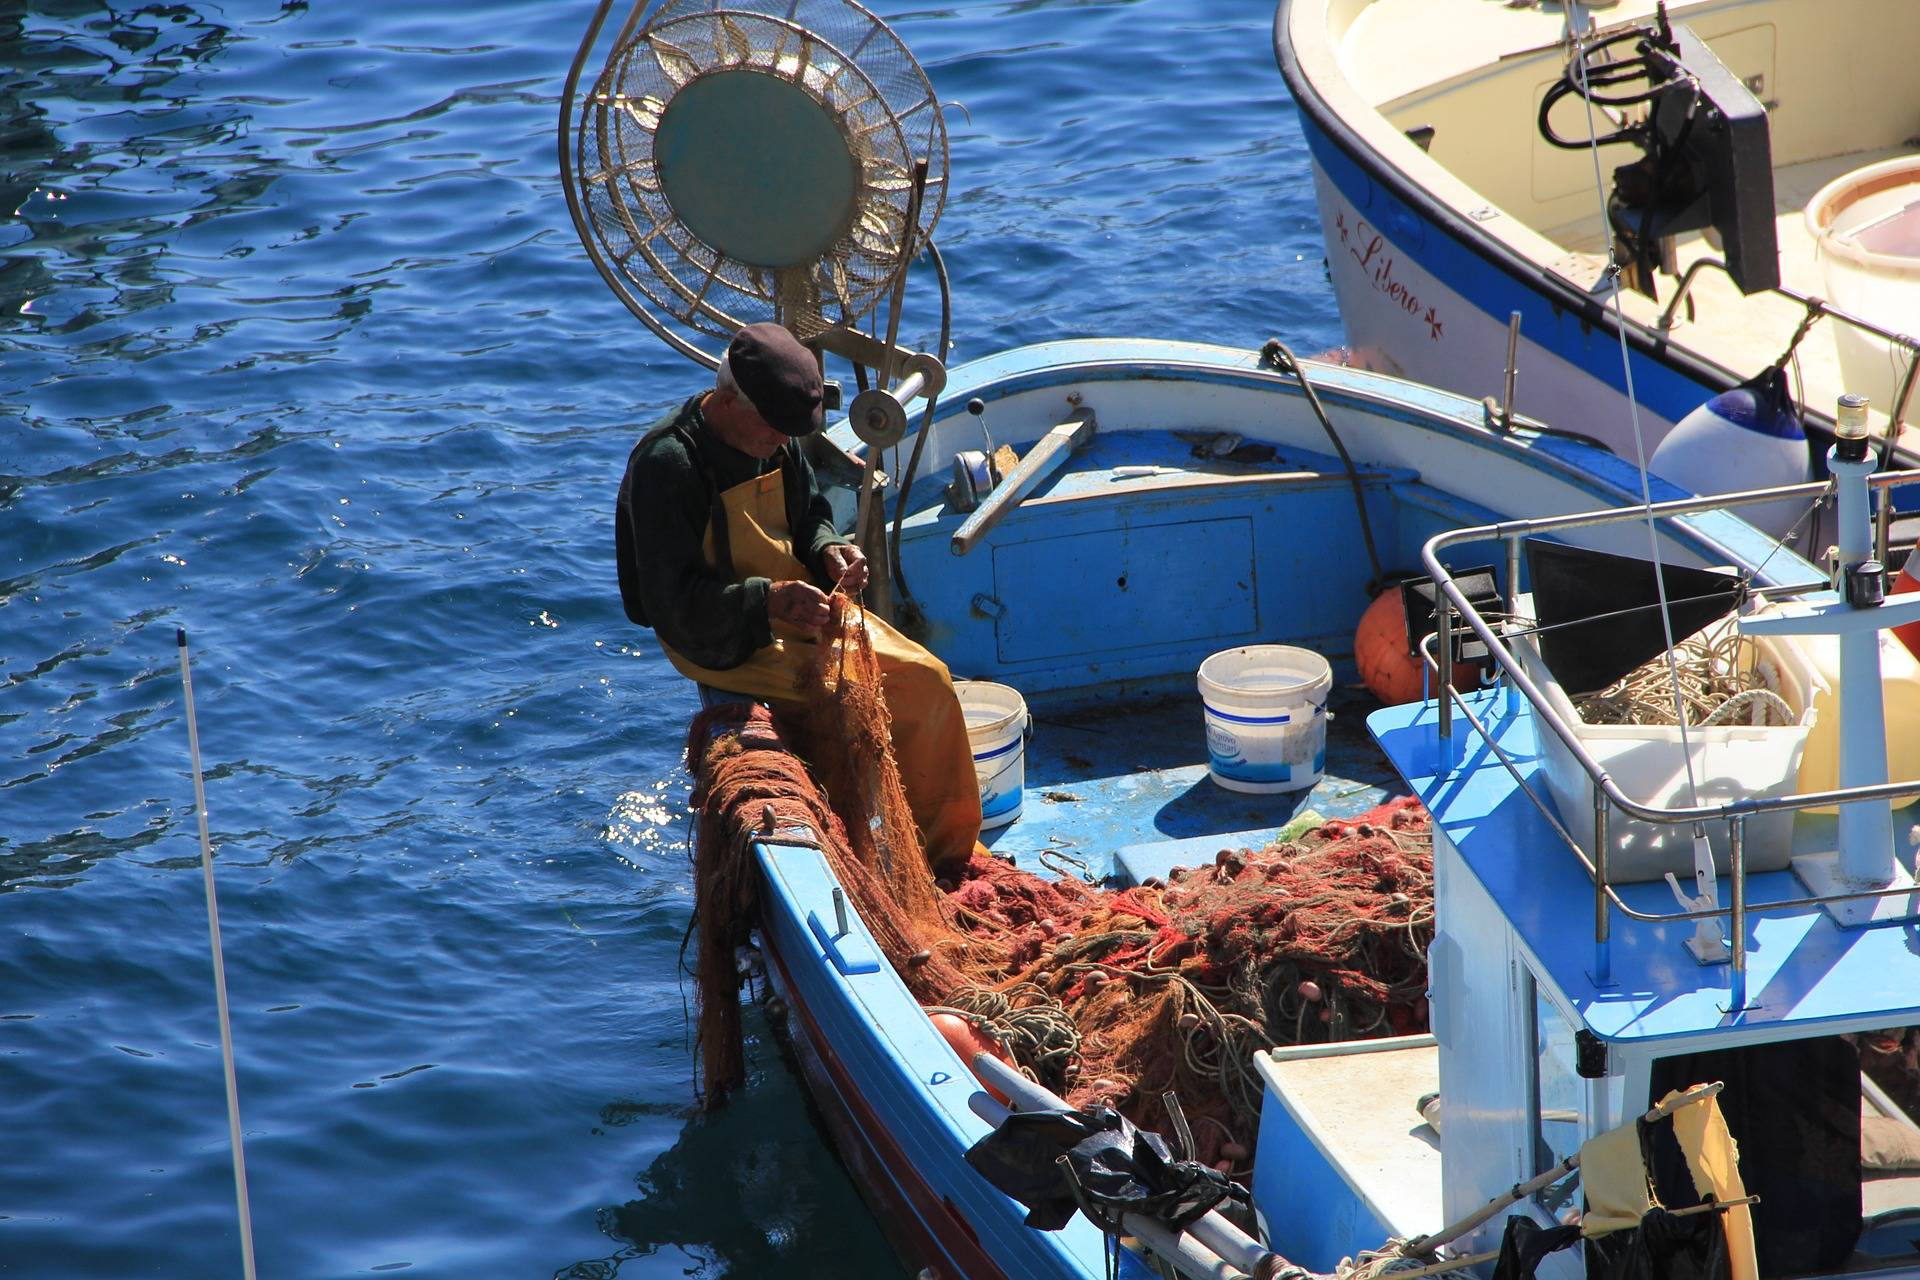 fisherman-834794_1920